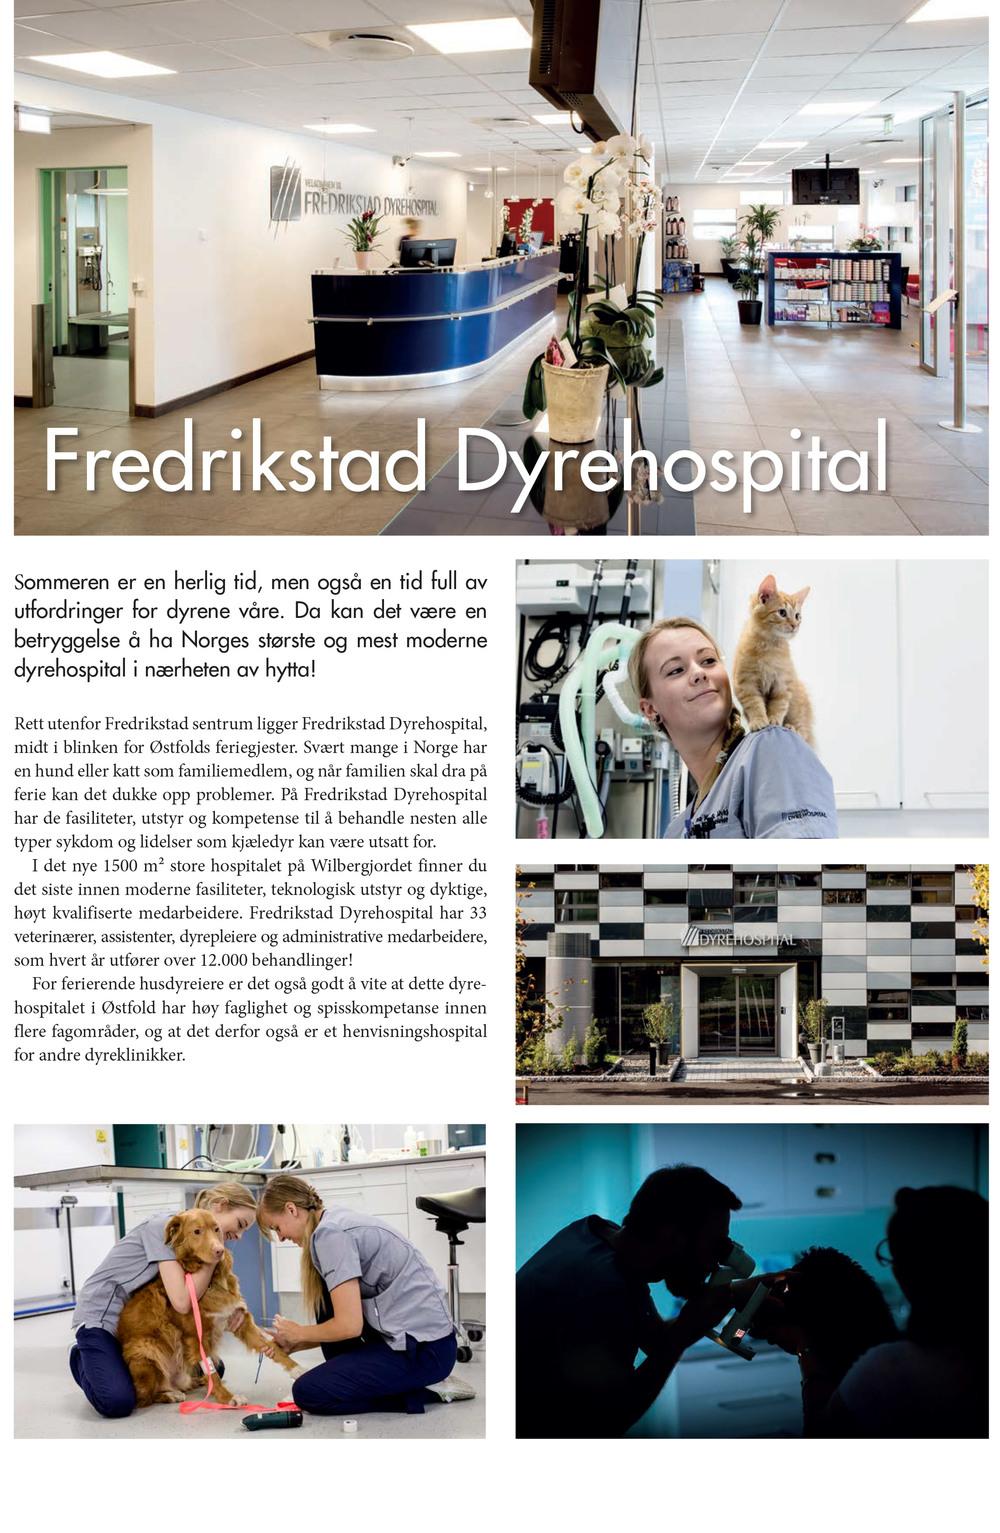 Fredrikstad dyrehospital